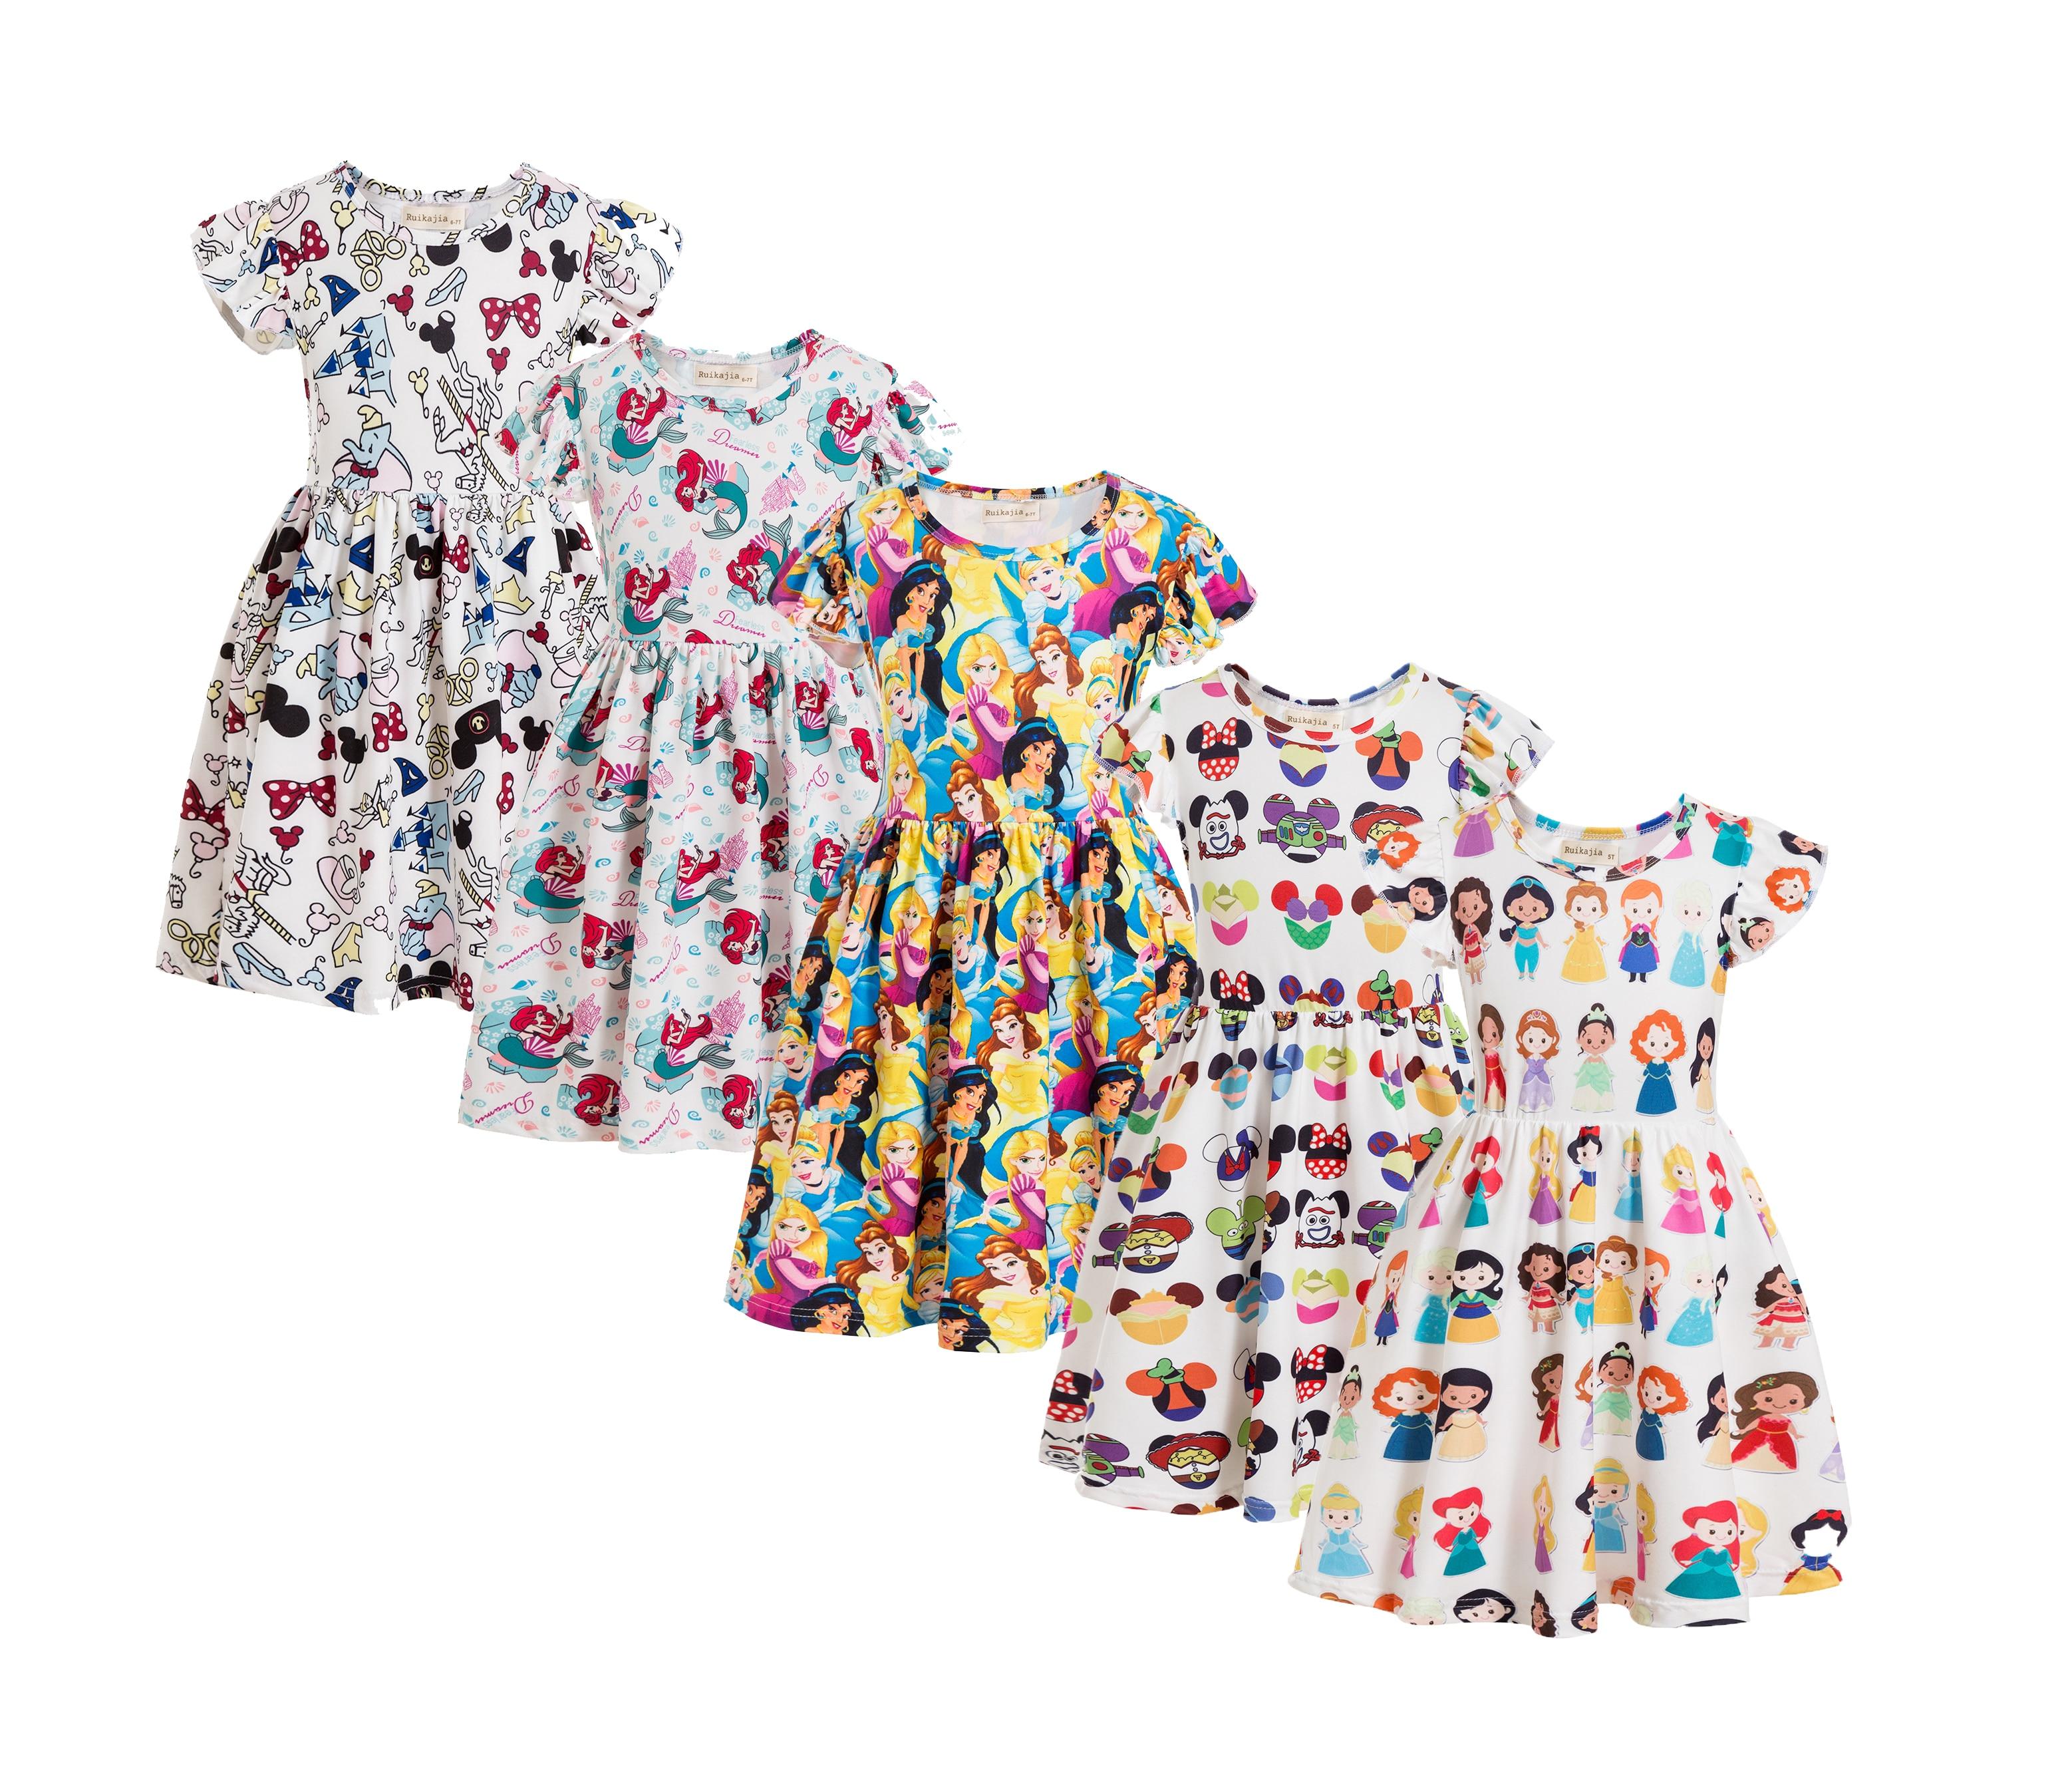 squarex Toddler Kids Baby Girls Long Sleeve Christmas Cartoon 3D Print Princess Dress Fashion Autumn Winter Dress